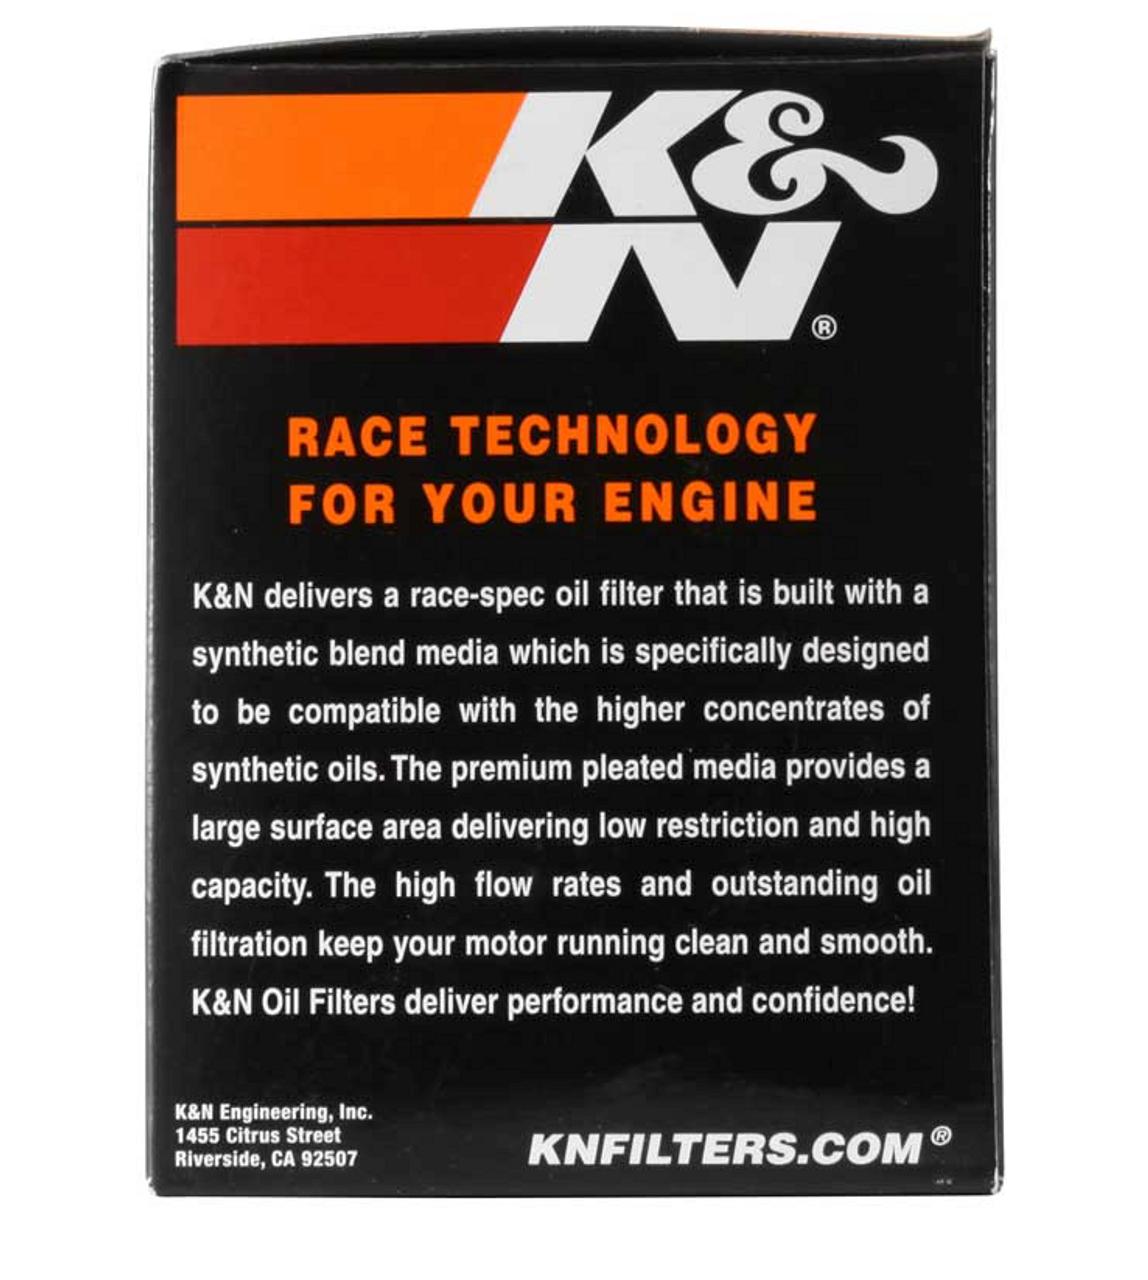 K&N Oil filter for Spyder 1330 (KN-556)